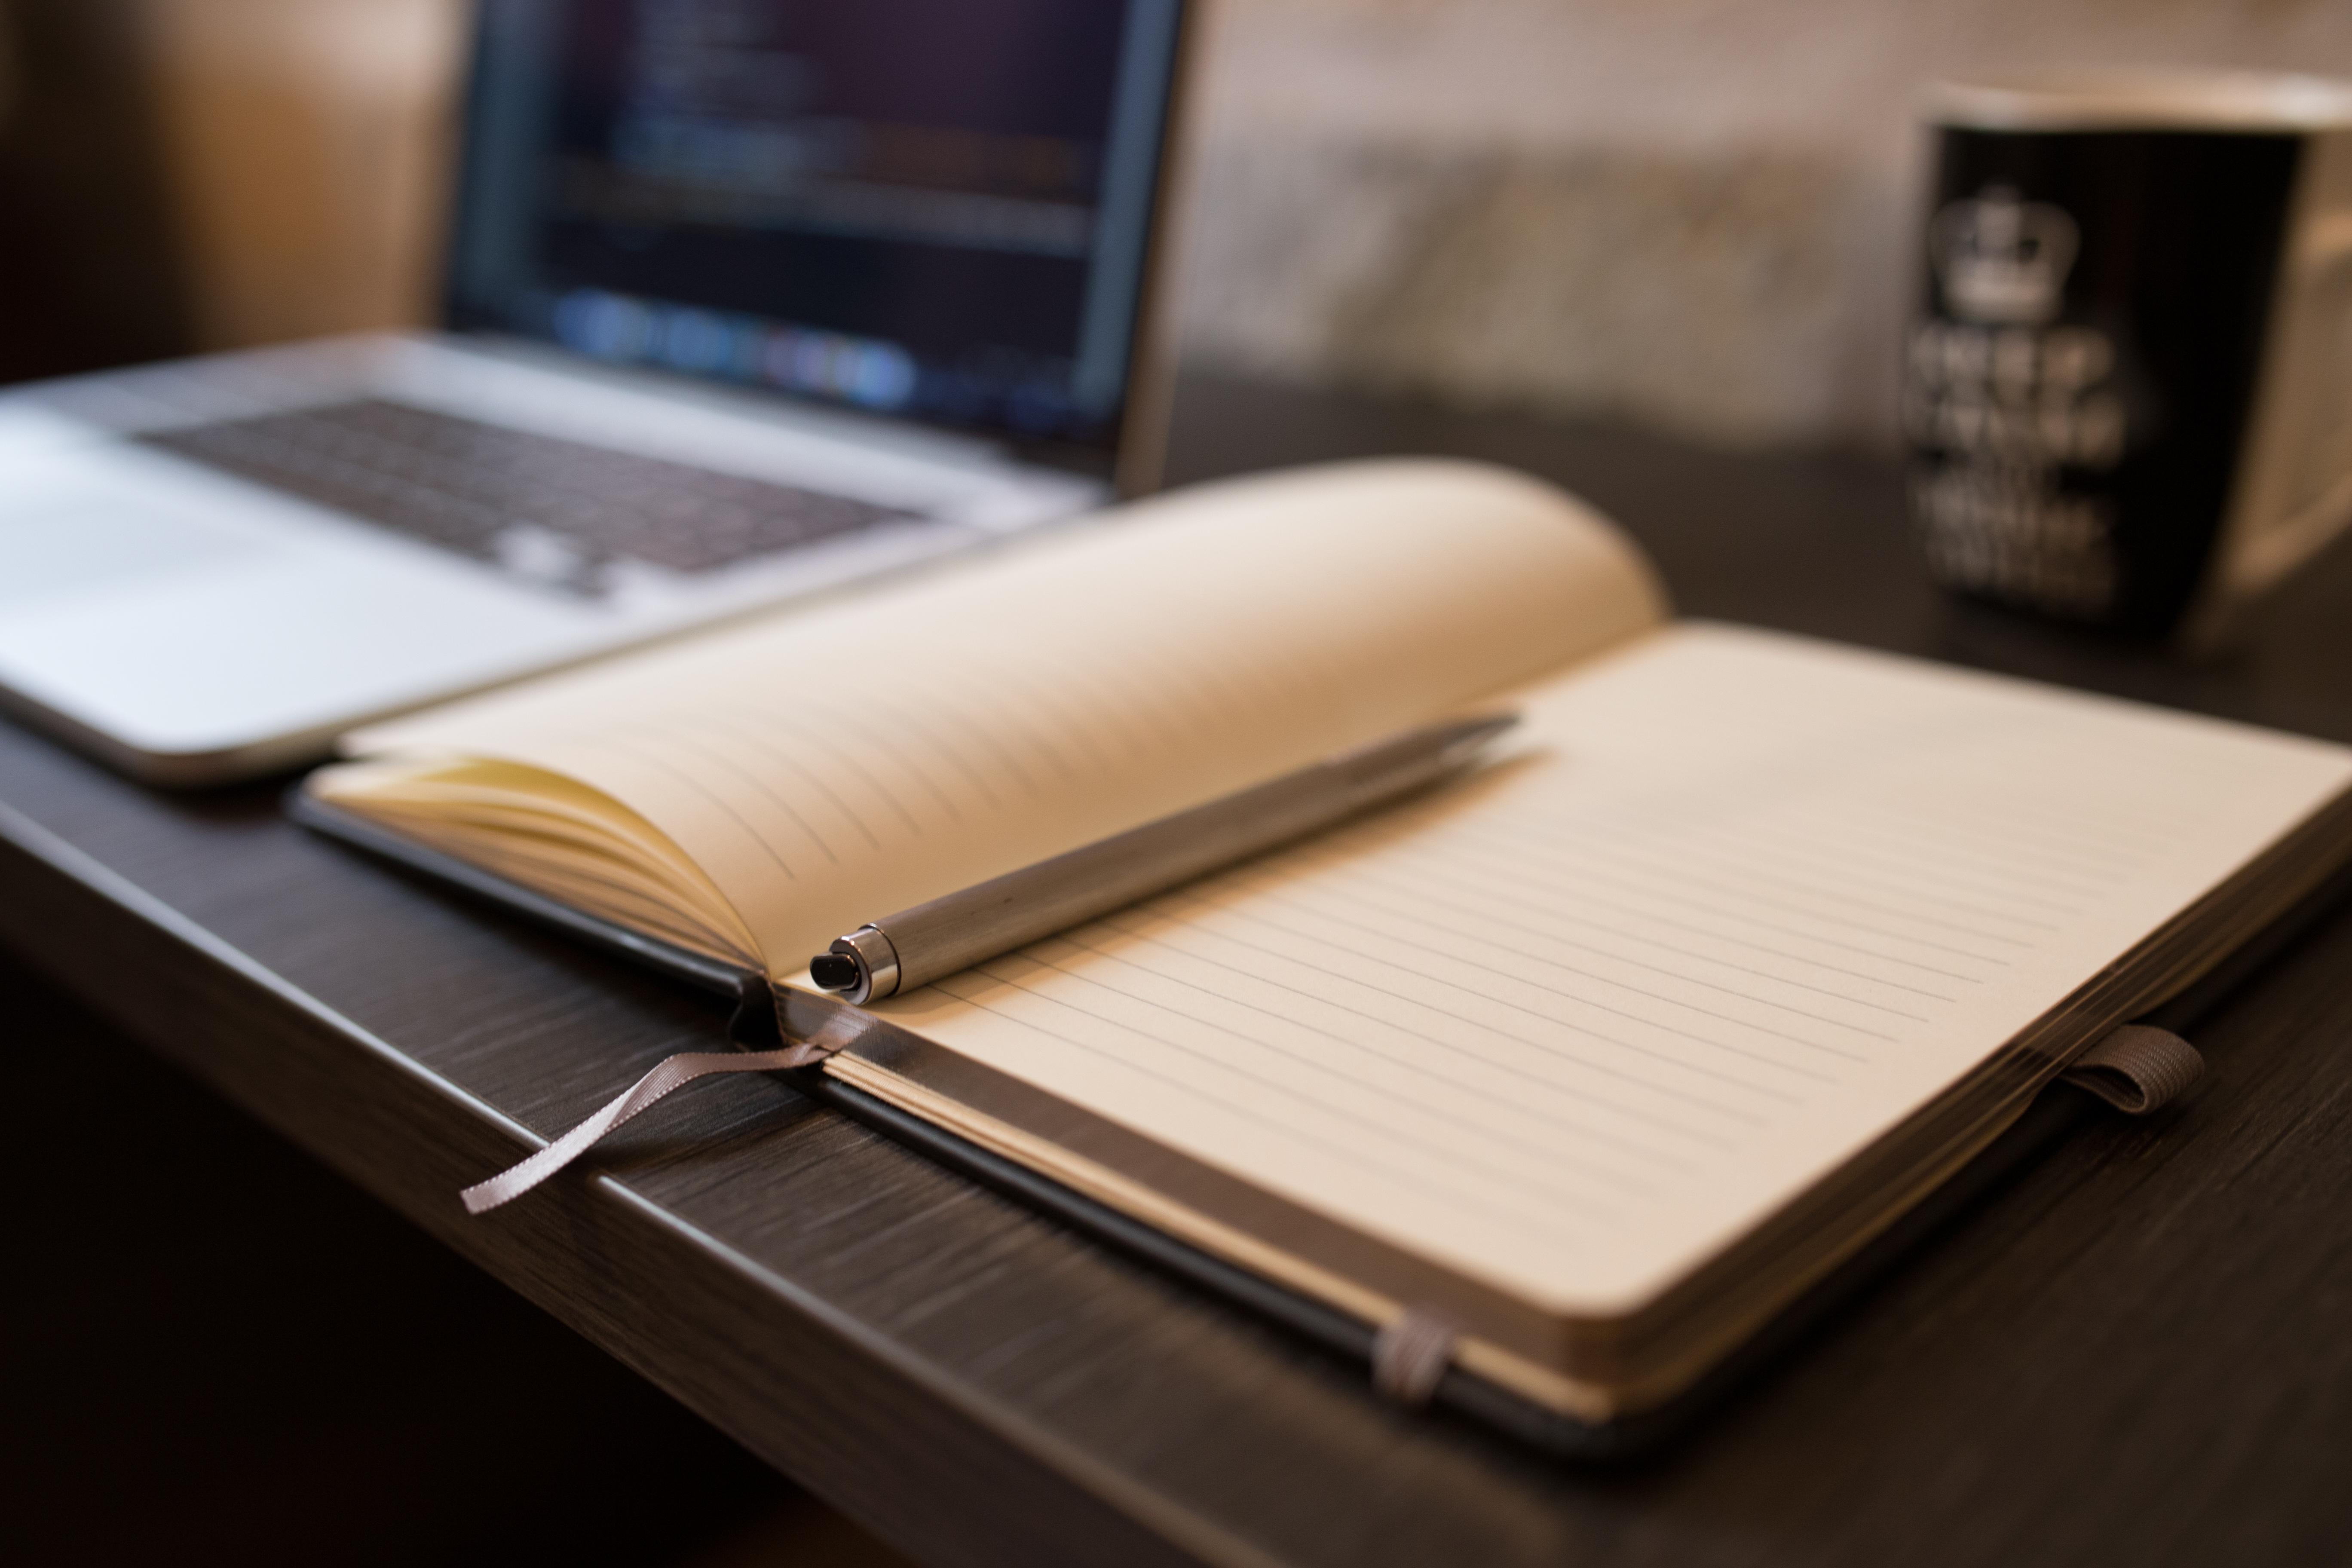 Diary, Coffee, Cup, Laptop, Mug, HQ Photo